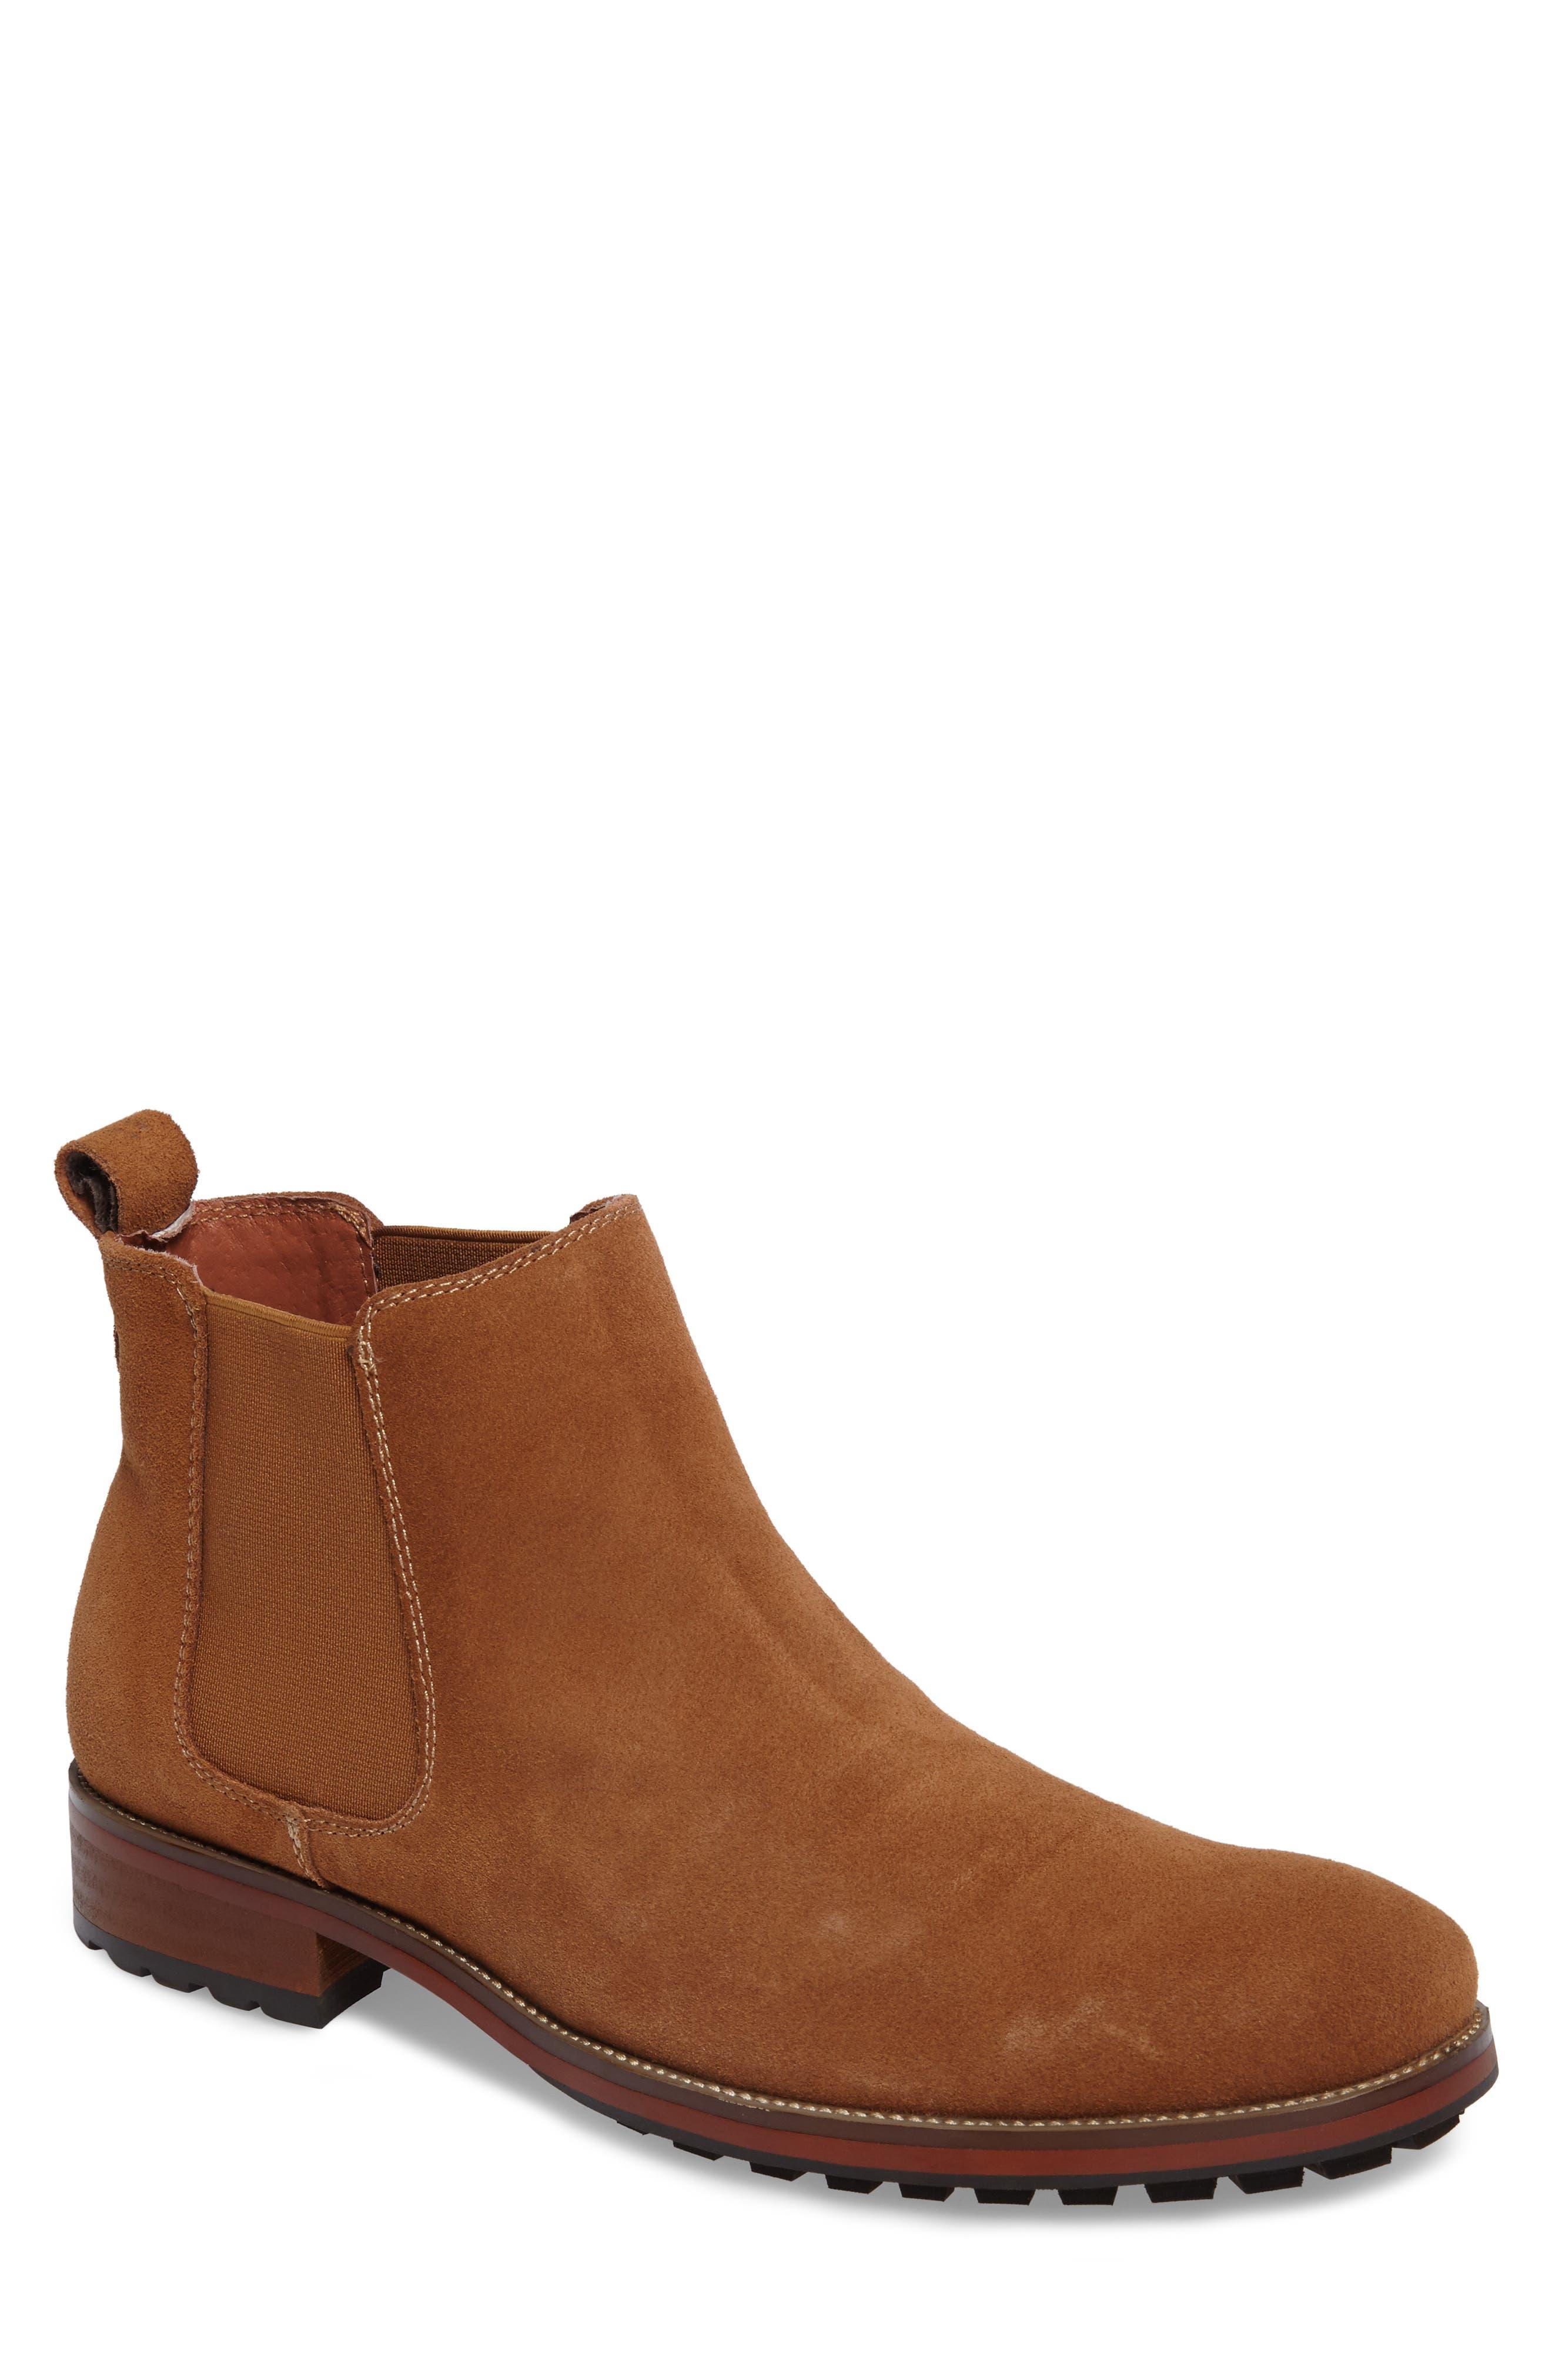 Alternate Image 1 Selected - Jump Carson Chelsea Boot (Men)